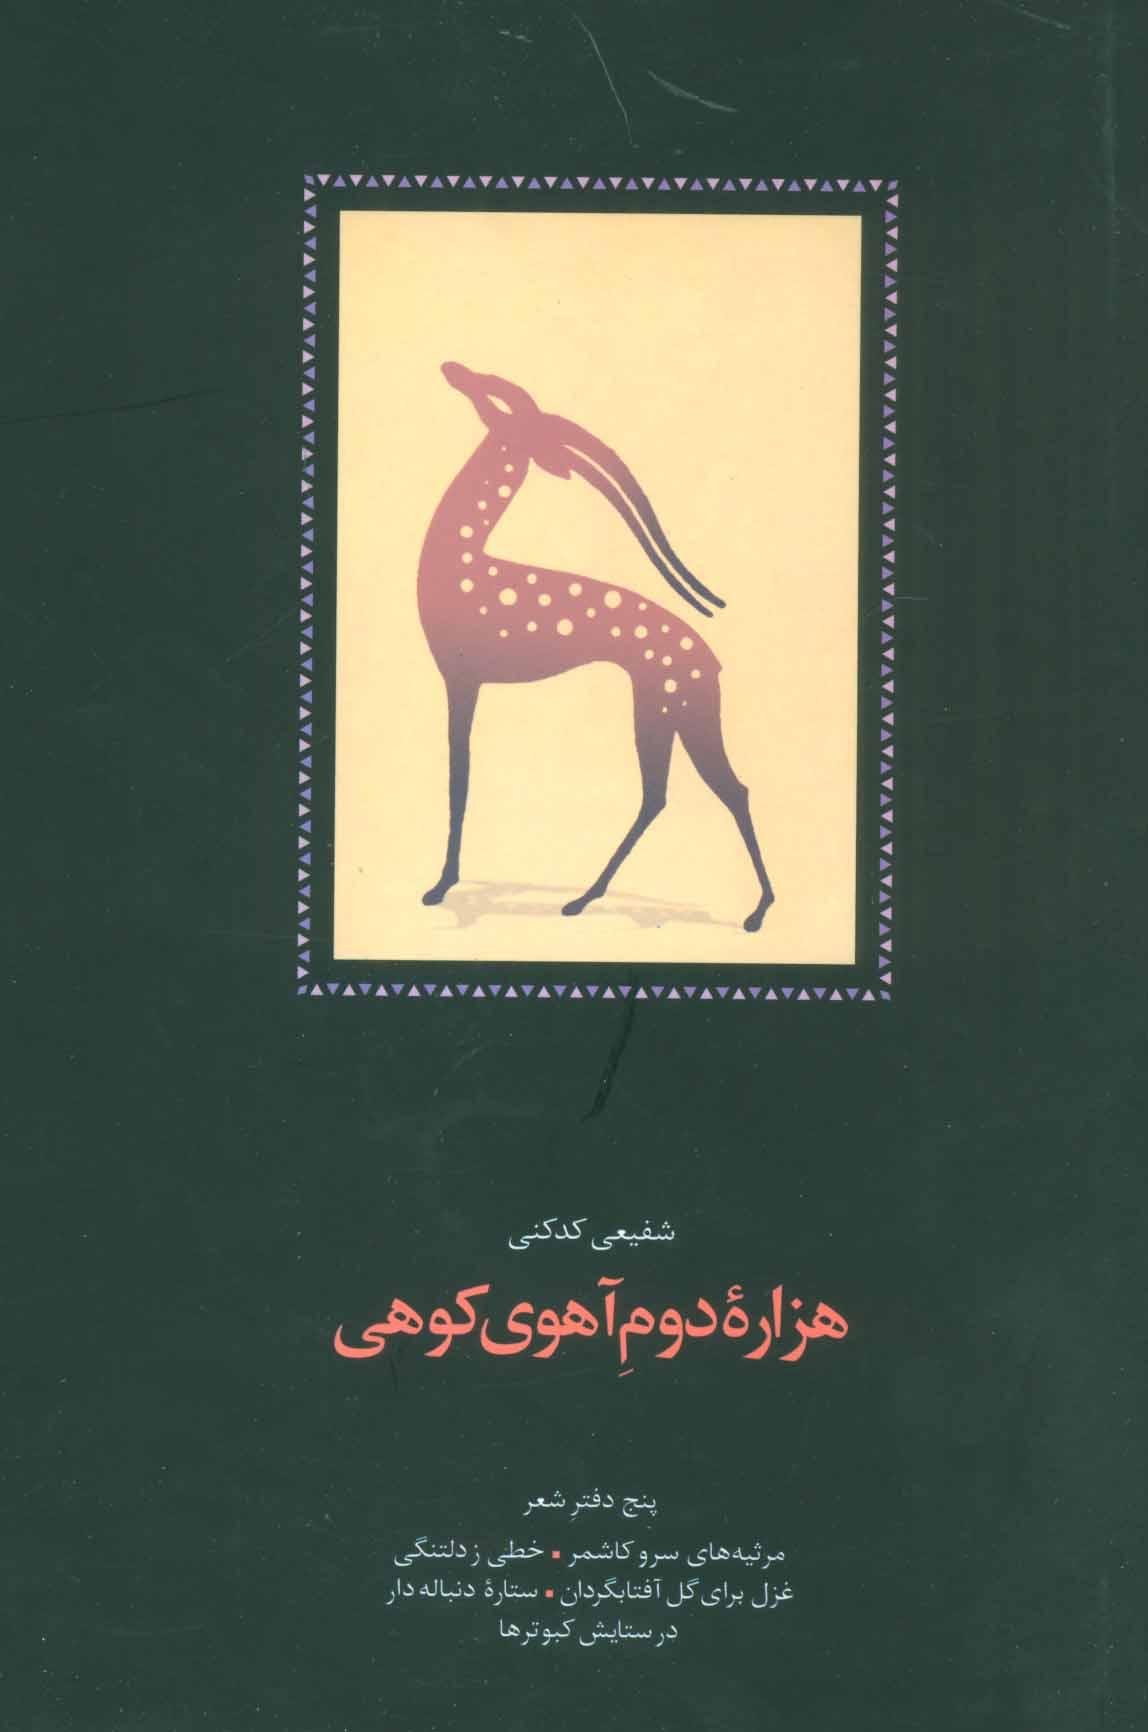 کتاب هزاره دوم آهوی کوهی